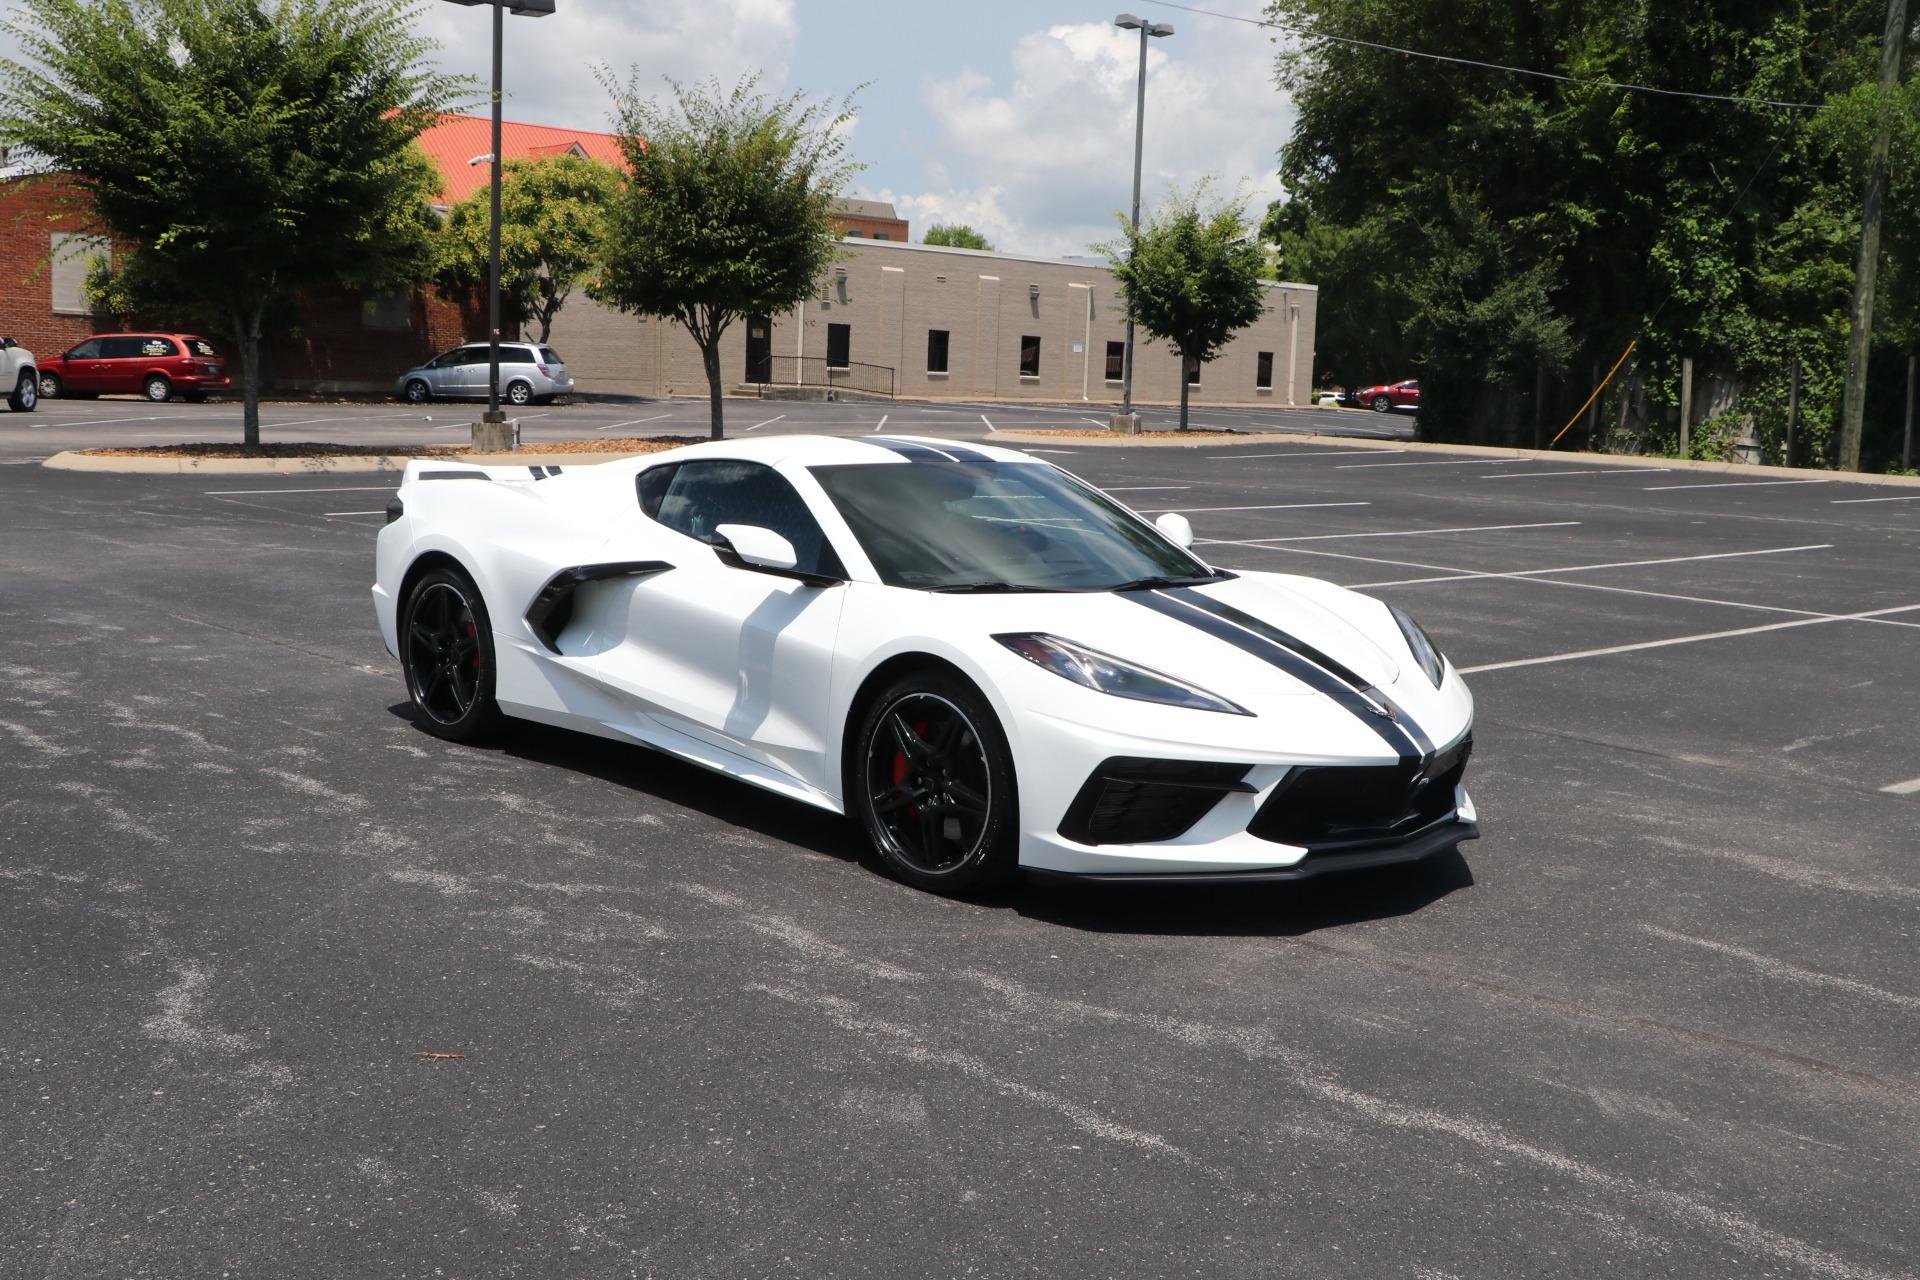 Used 2021 Chevrolet Corvette Stingray COUPE 3LT W/PERFORMANCE PKG for sale $113,950 at Auto Collection in Murfreesboro TN 37130 1